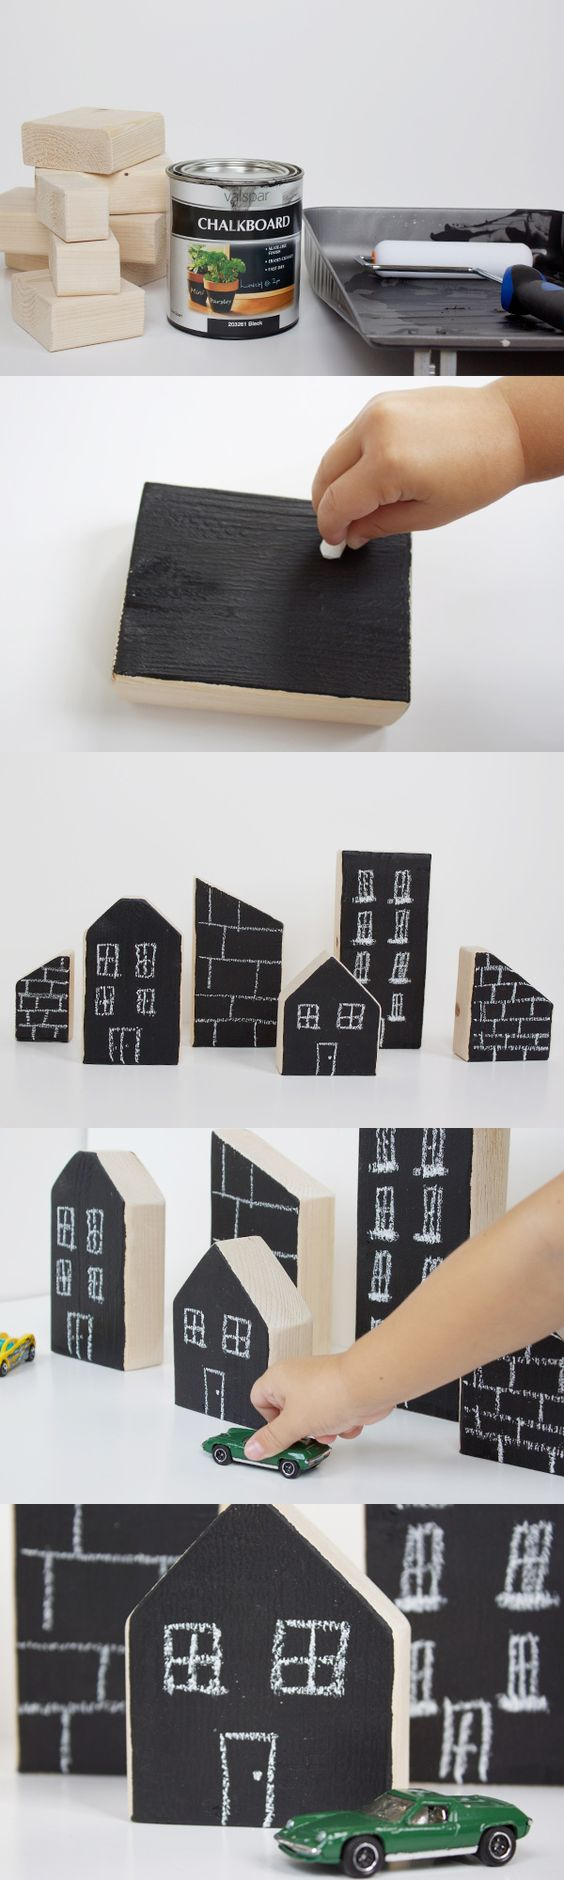 juguetes-madera-bloques-pizarra-muy-ingenioso-2